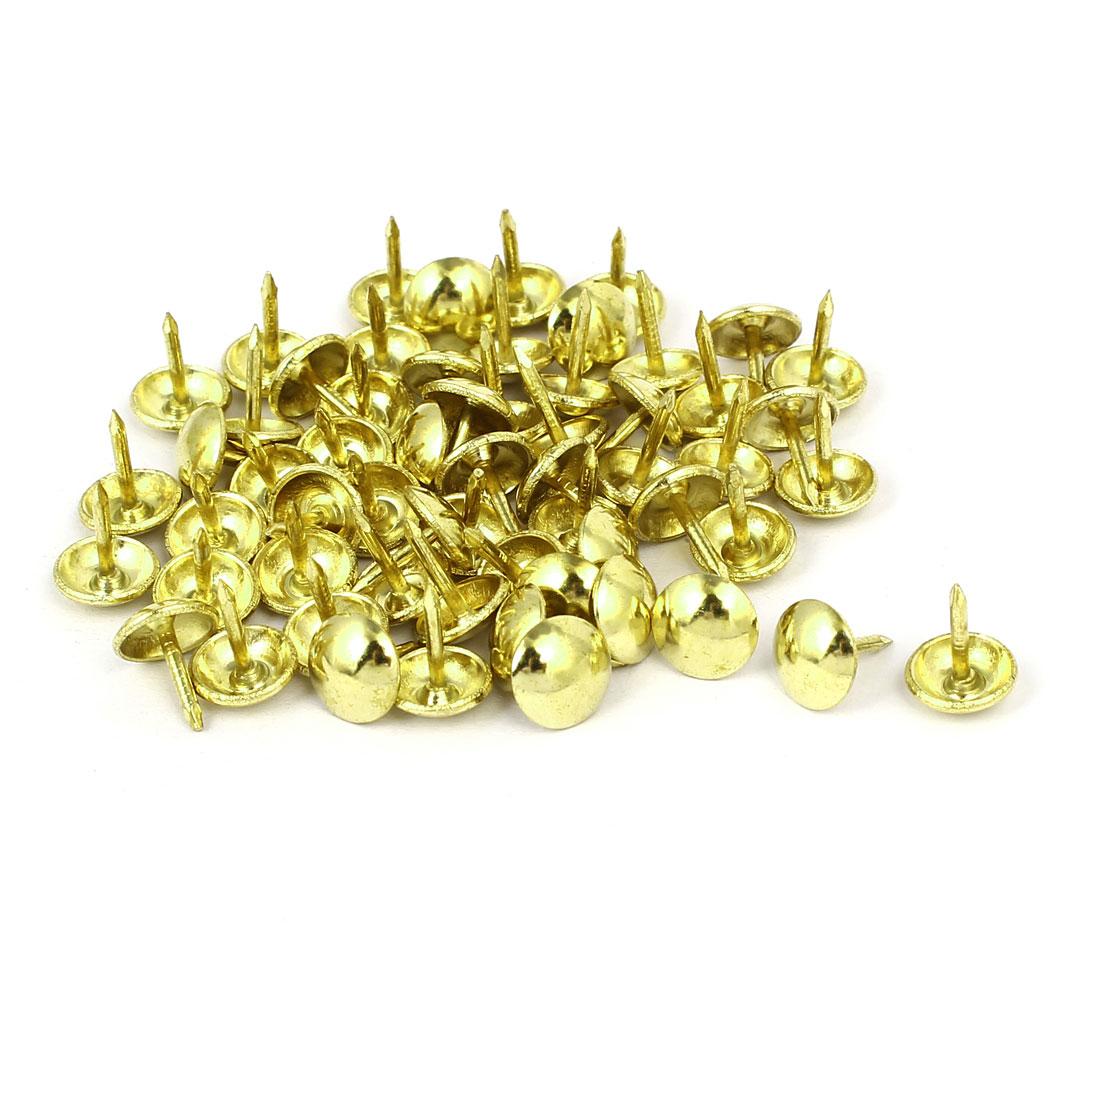 Home Furniture Upholstery Thumb Tack Nail Push Pin Gold Tone 9mm x 11mm 60pcs